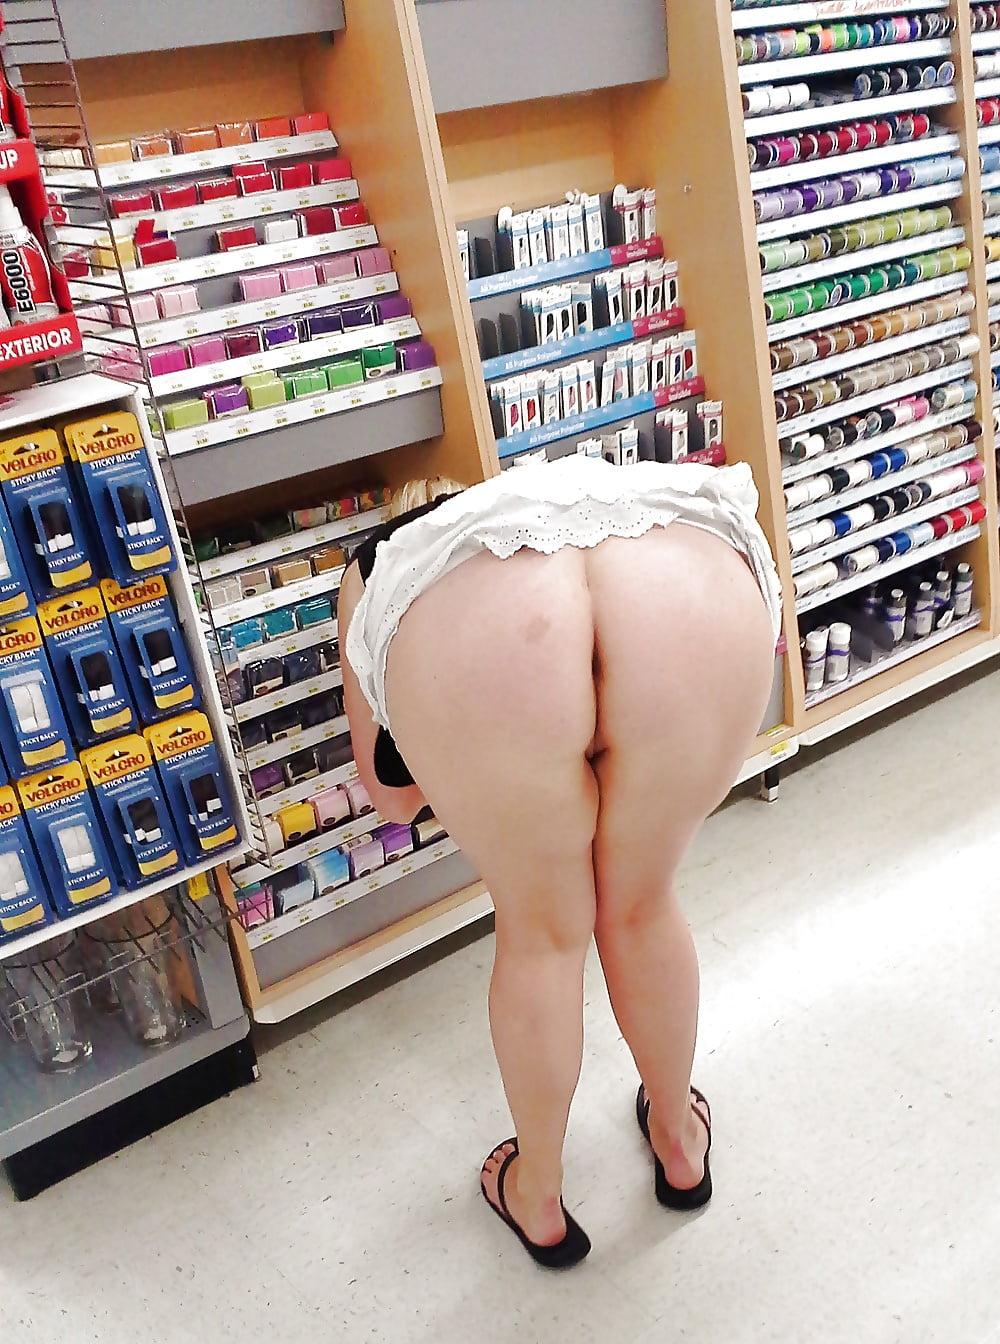 Naked girls of walmart uncensored